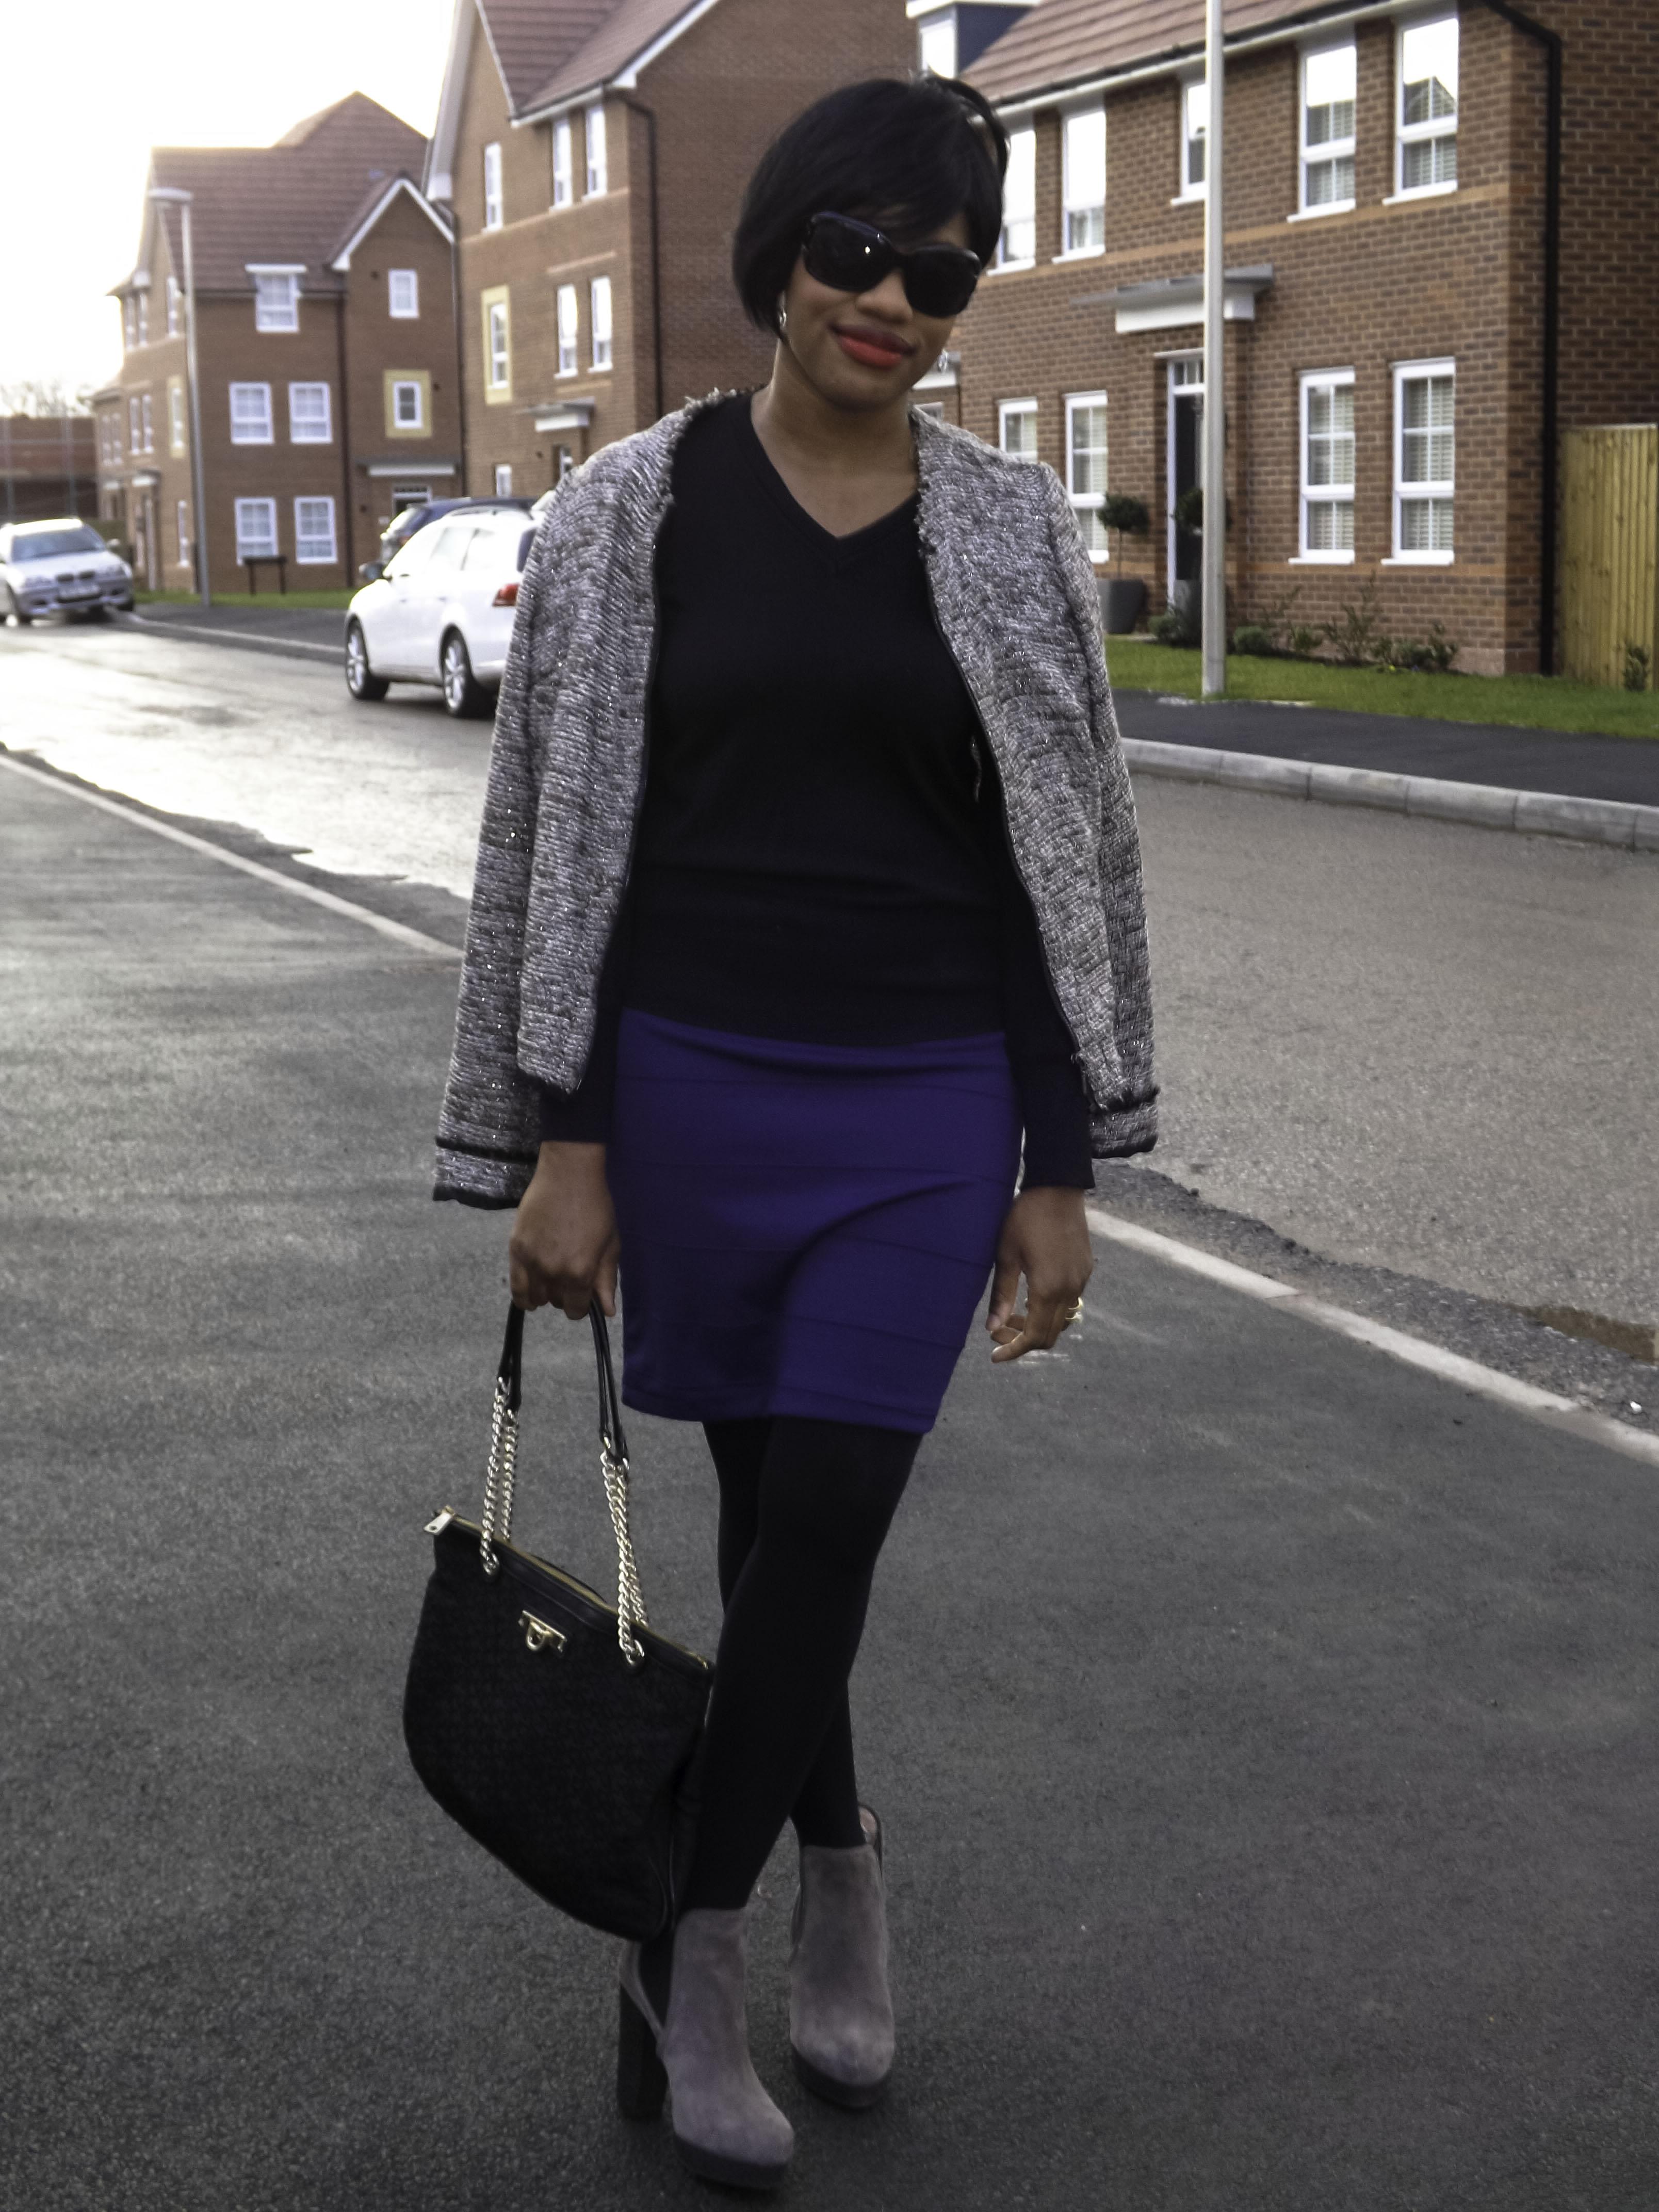 Nicki Minaj Wears See Through Tights Fashionista